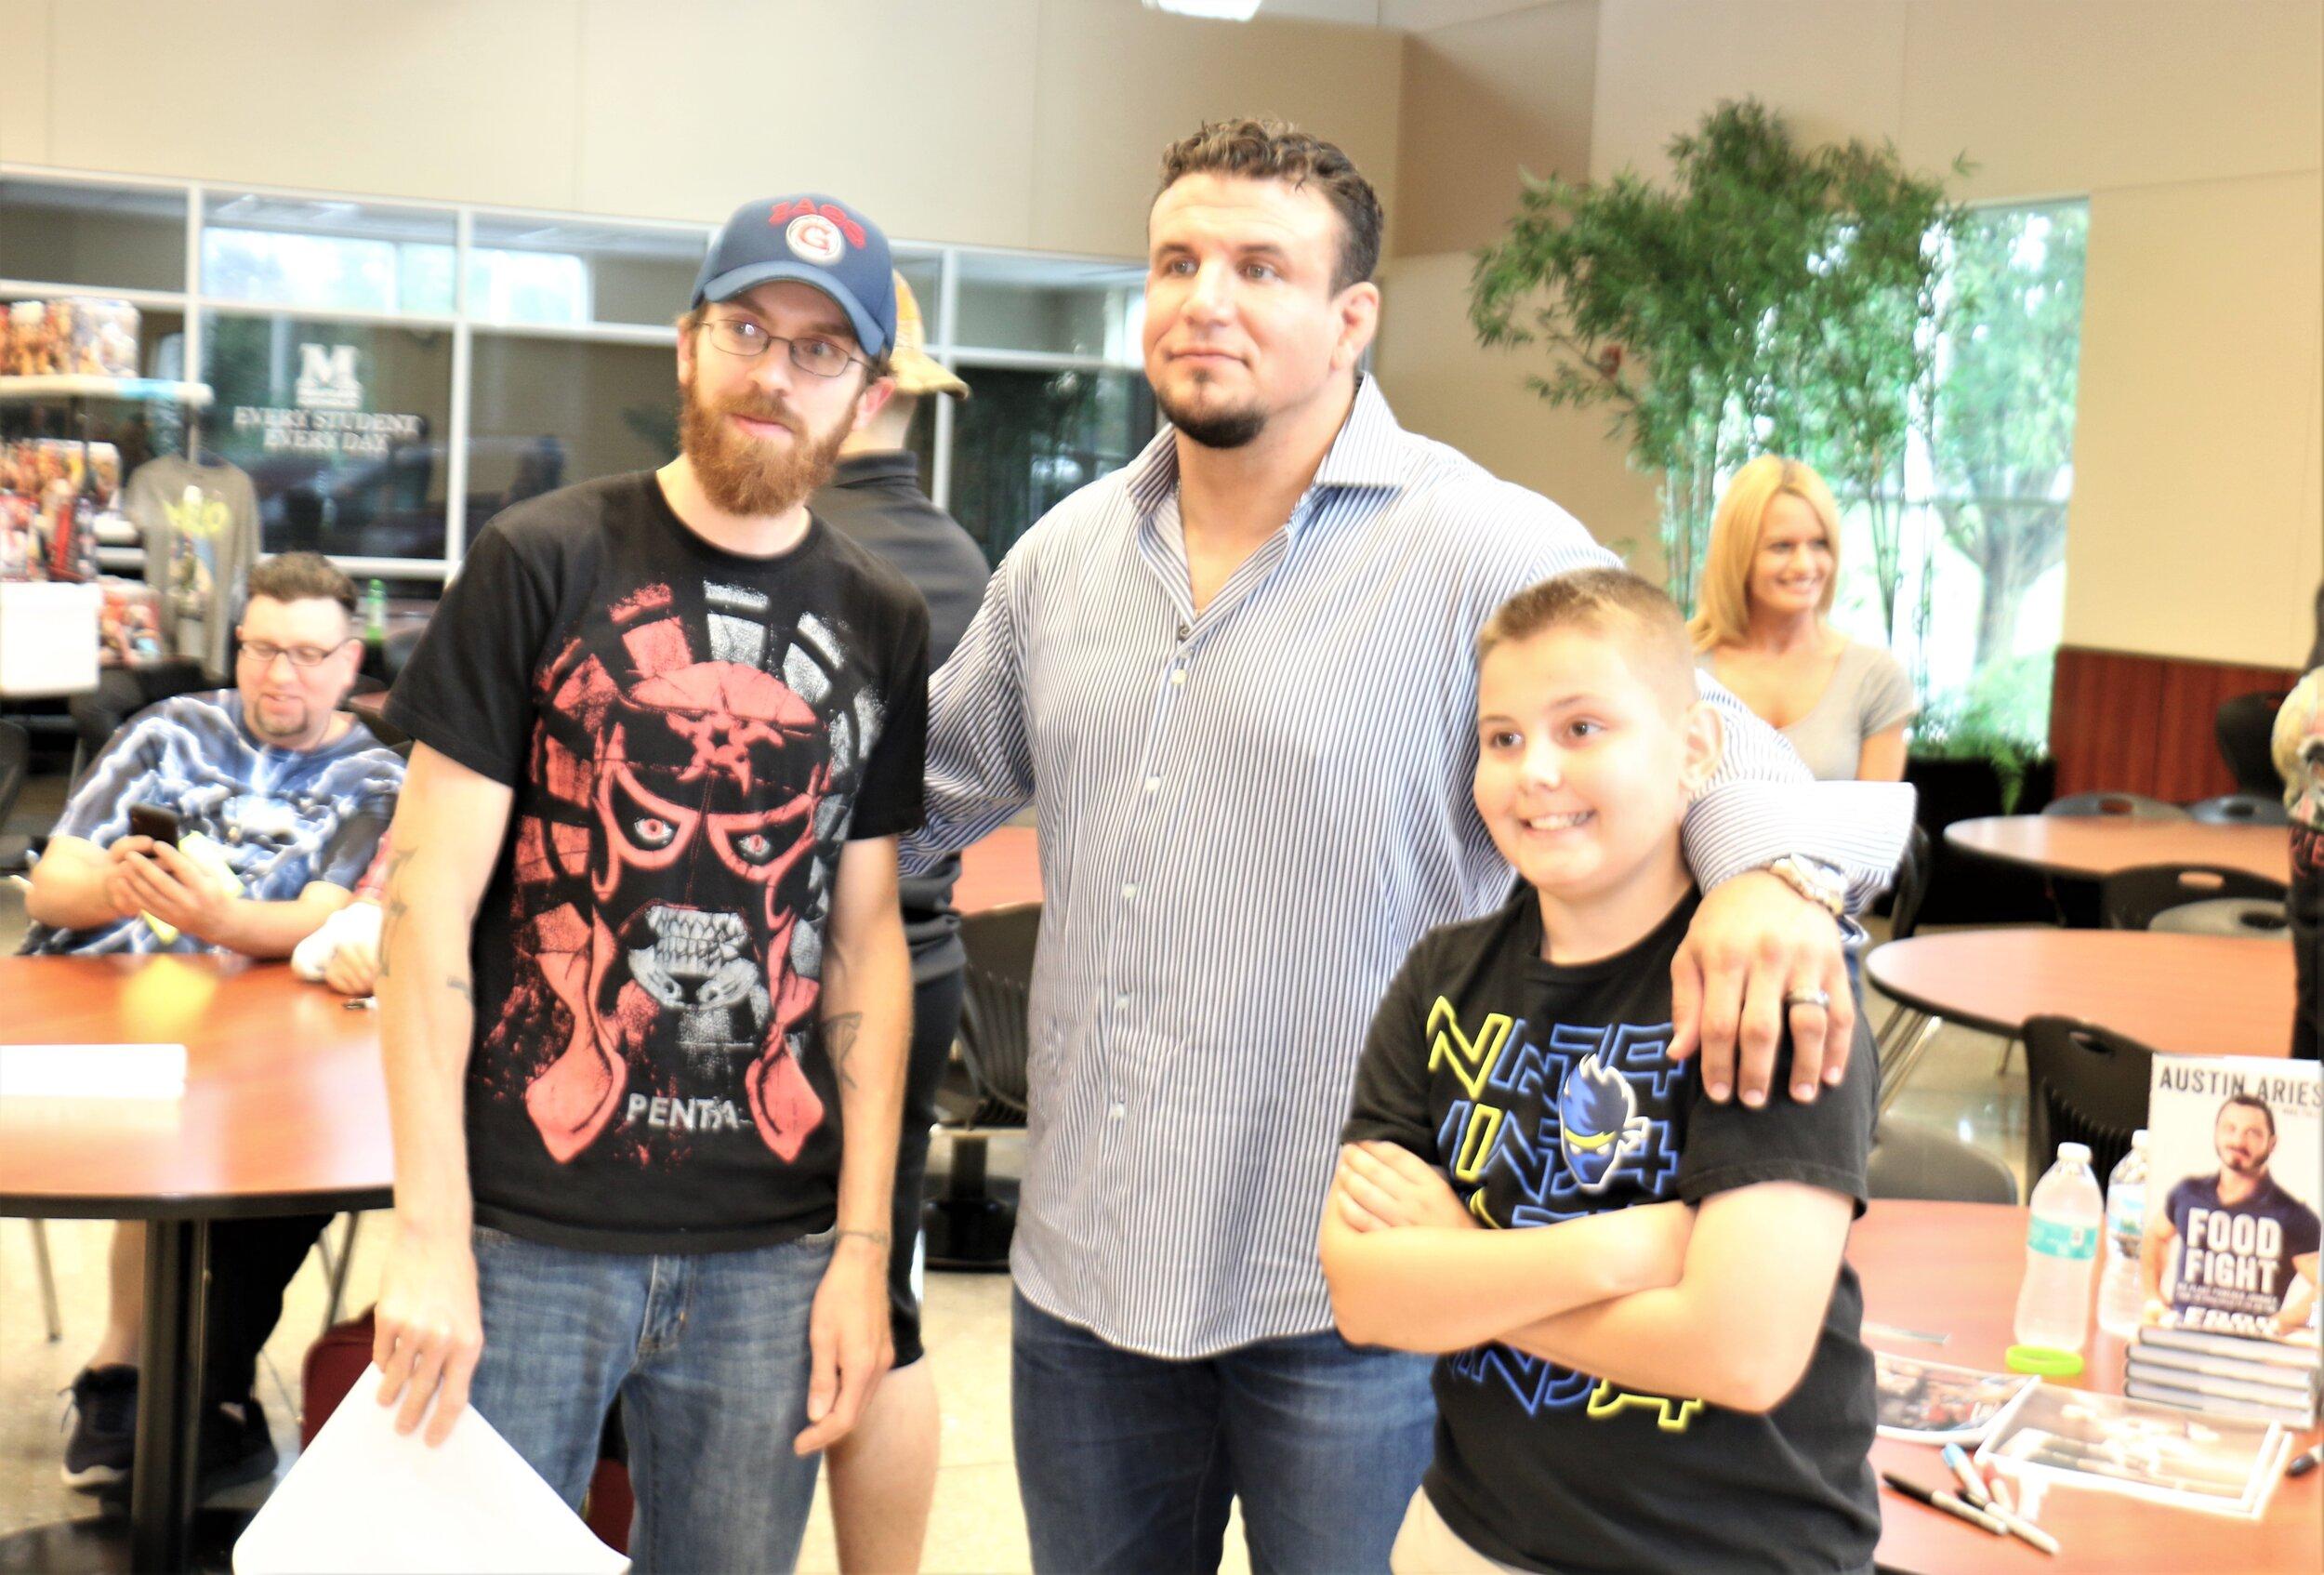 Fans pose with UFC legend Frank Mir, center, at the Warrior Wrestling 6 VIP Fan Fest.